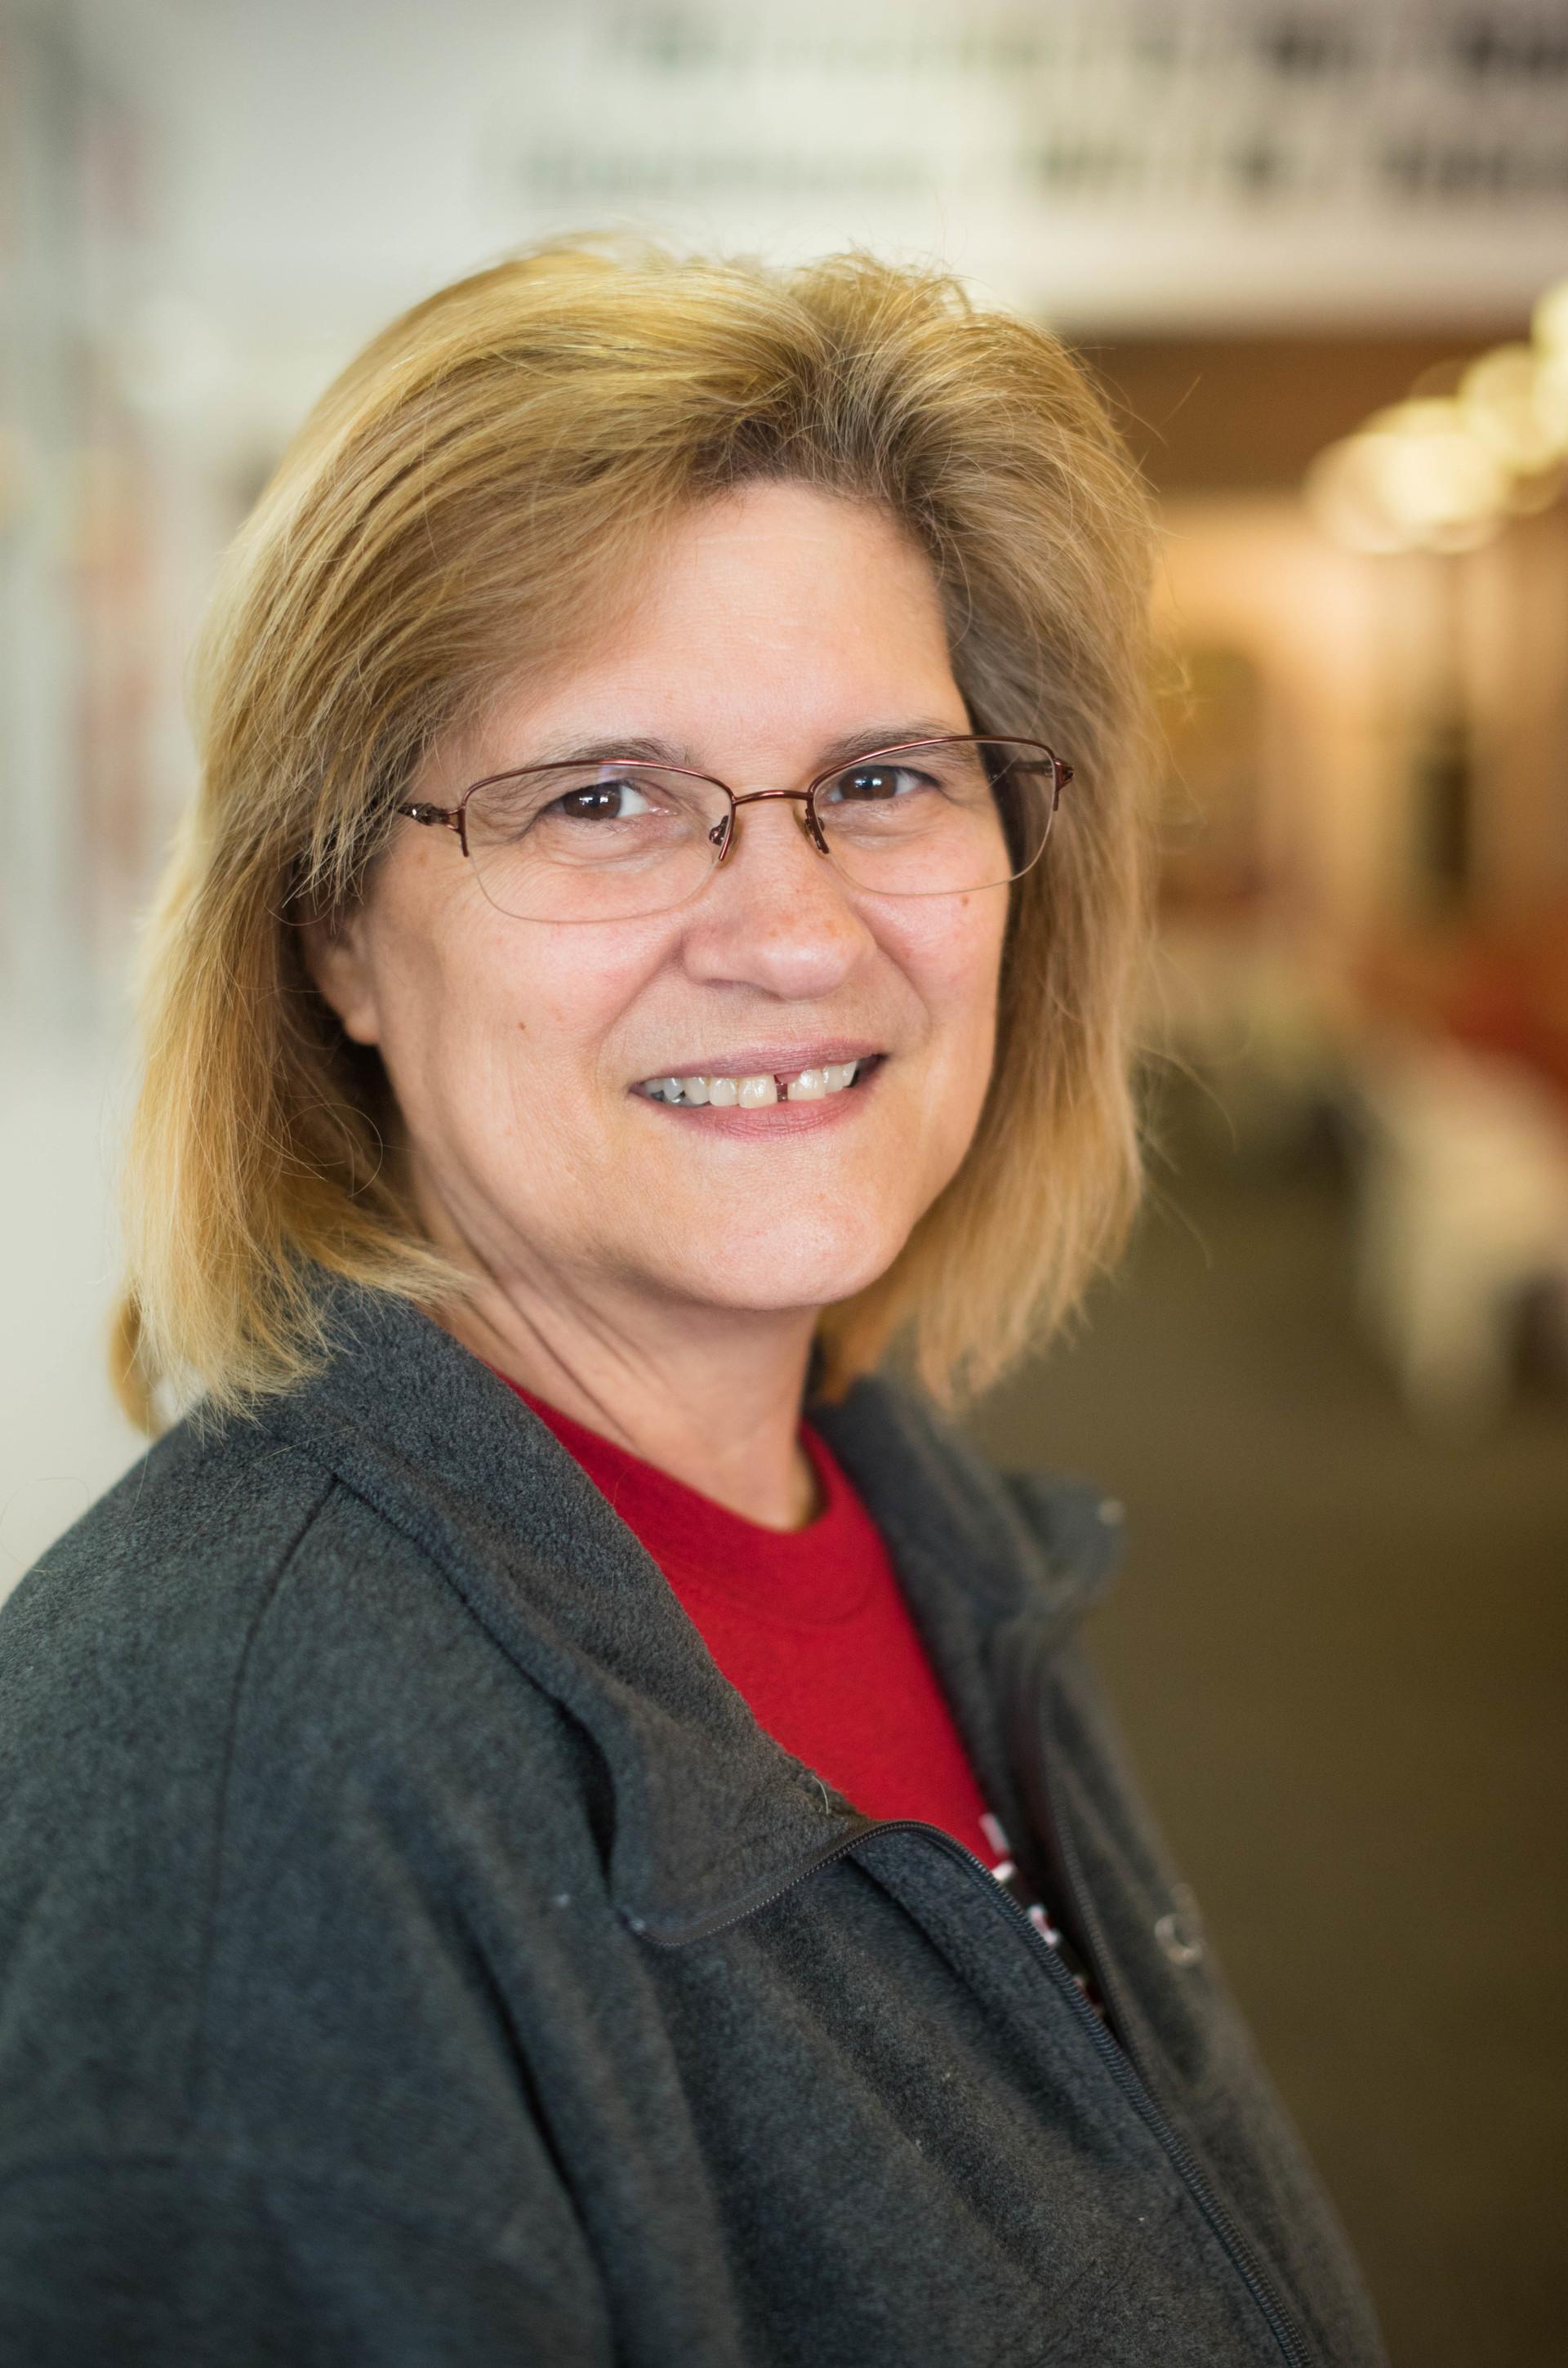 Lynn Heim, Office Manager for Buffalo NY Karate School